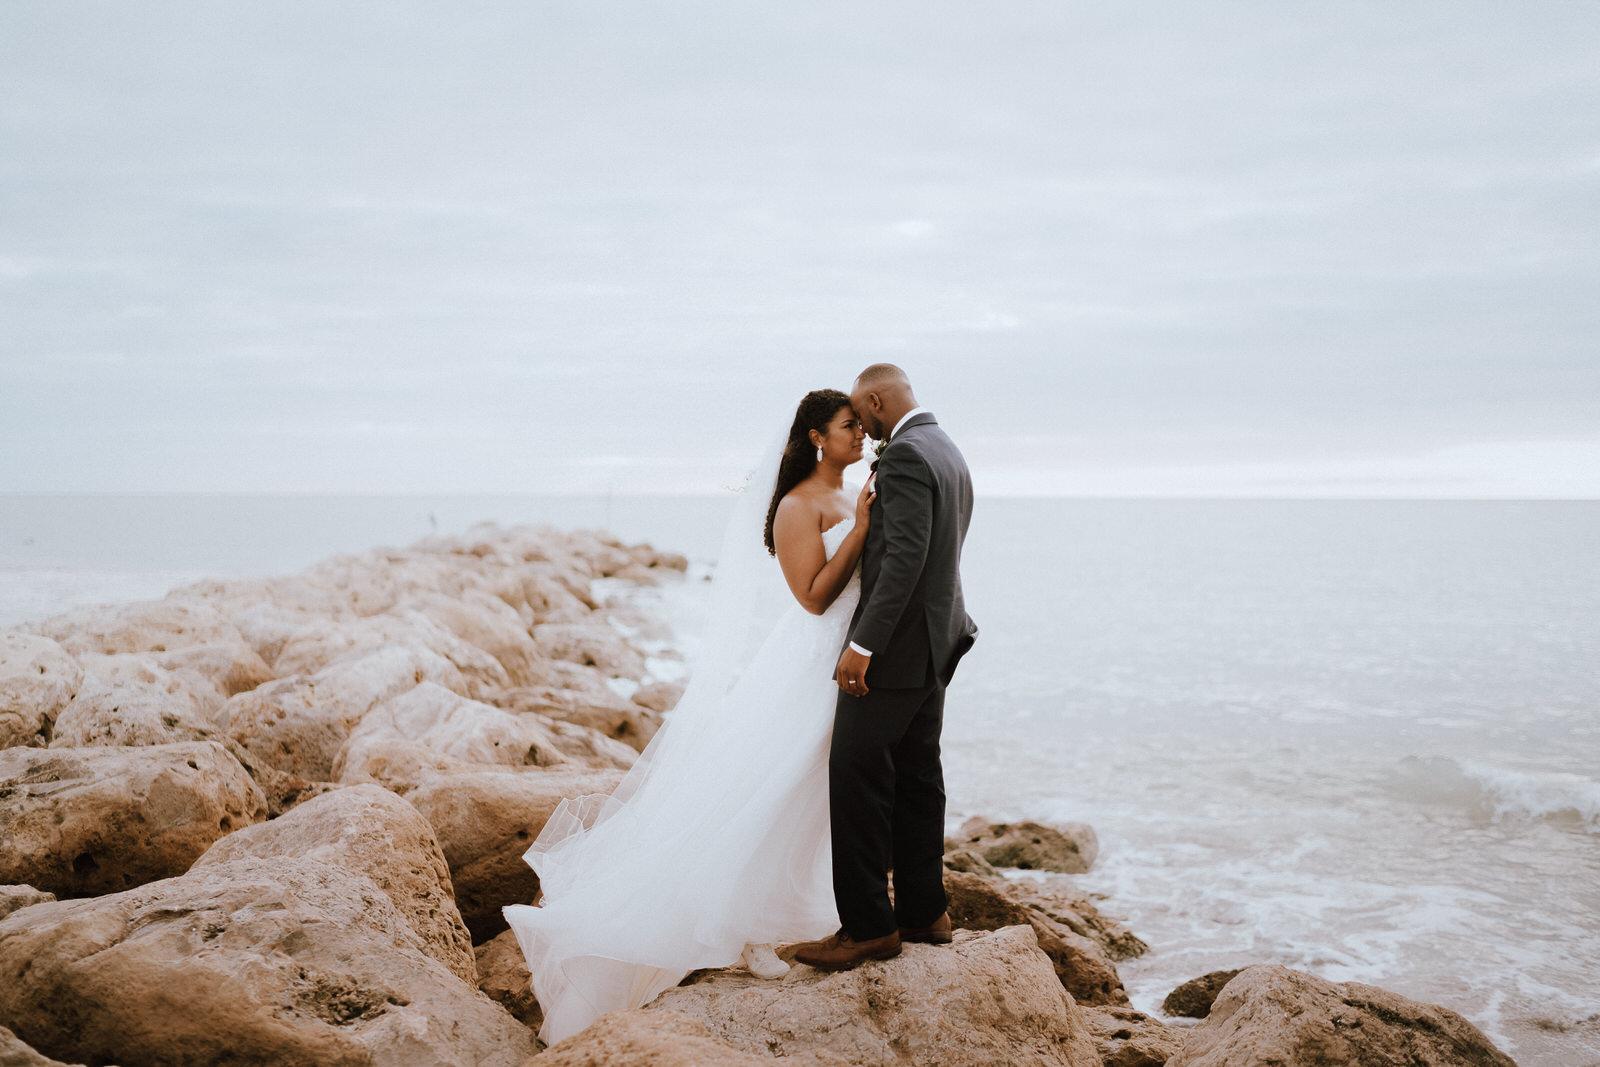 South Seas Island Resort Elopement- Alyana and Shawn- Michelle Gonzalez Photography-544.JPG